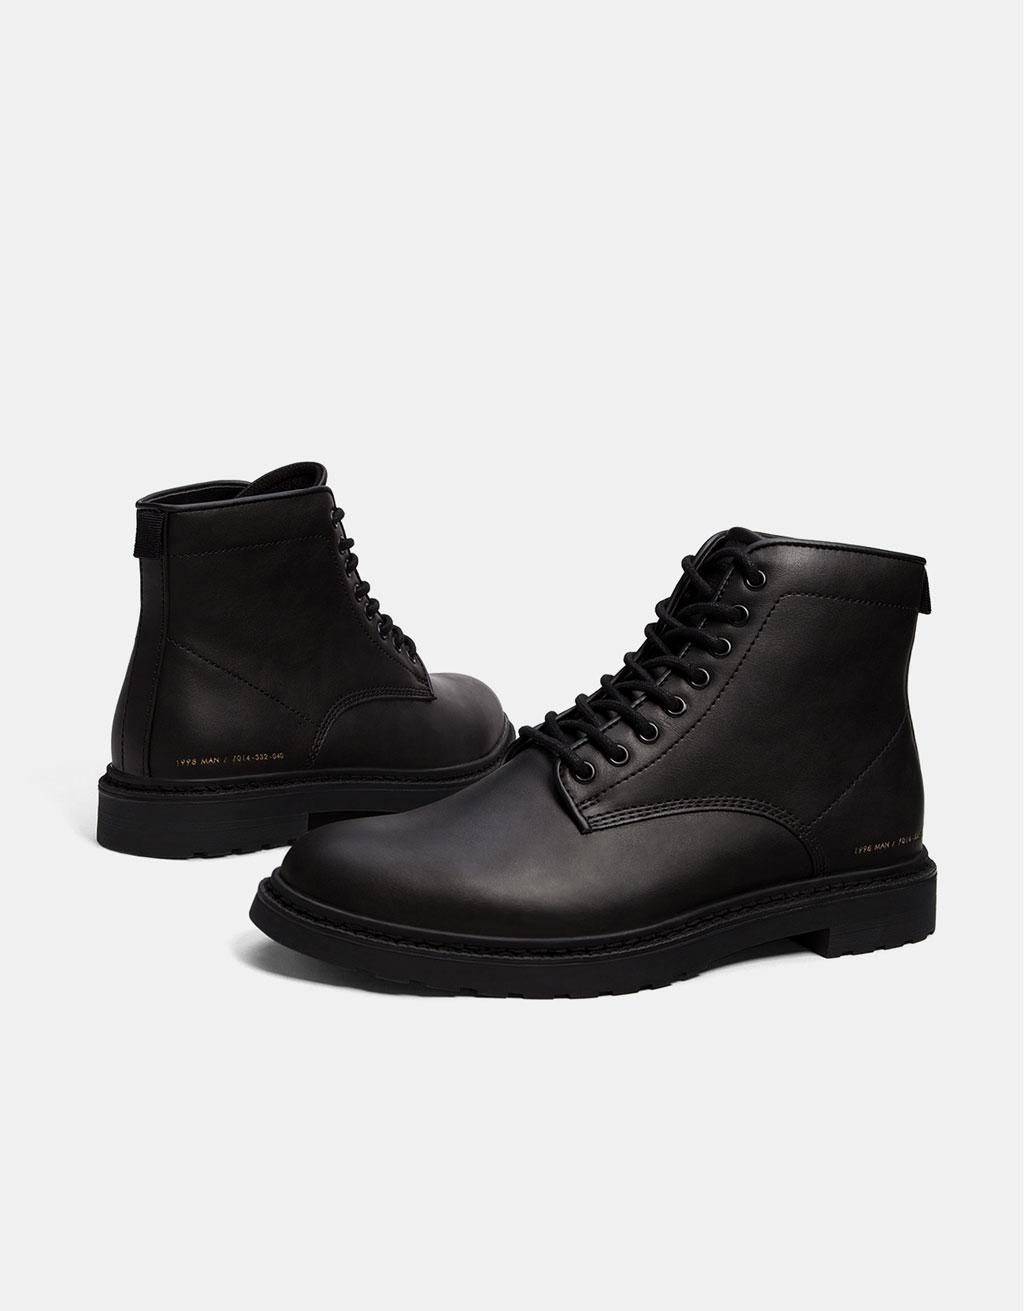 chaussures pour homme automne hiver 2017 bershka. Black Bedroom Furniture Sets. Home Design Ideas